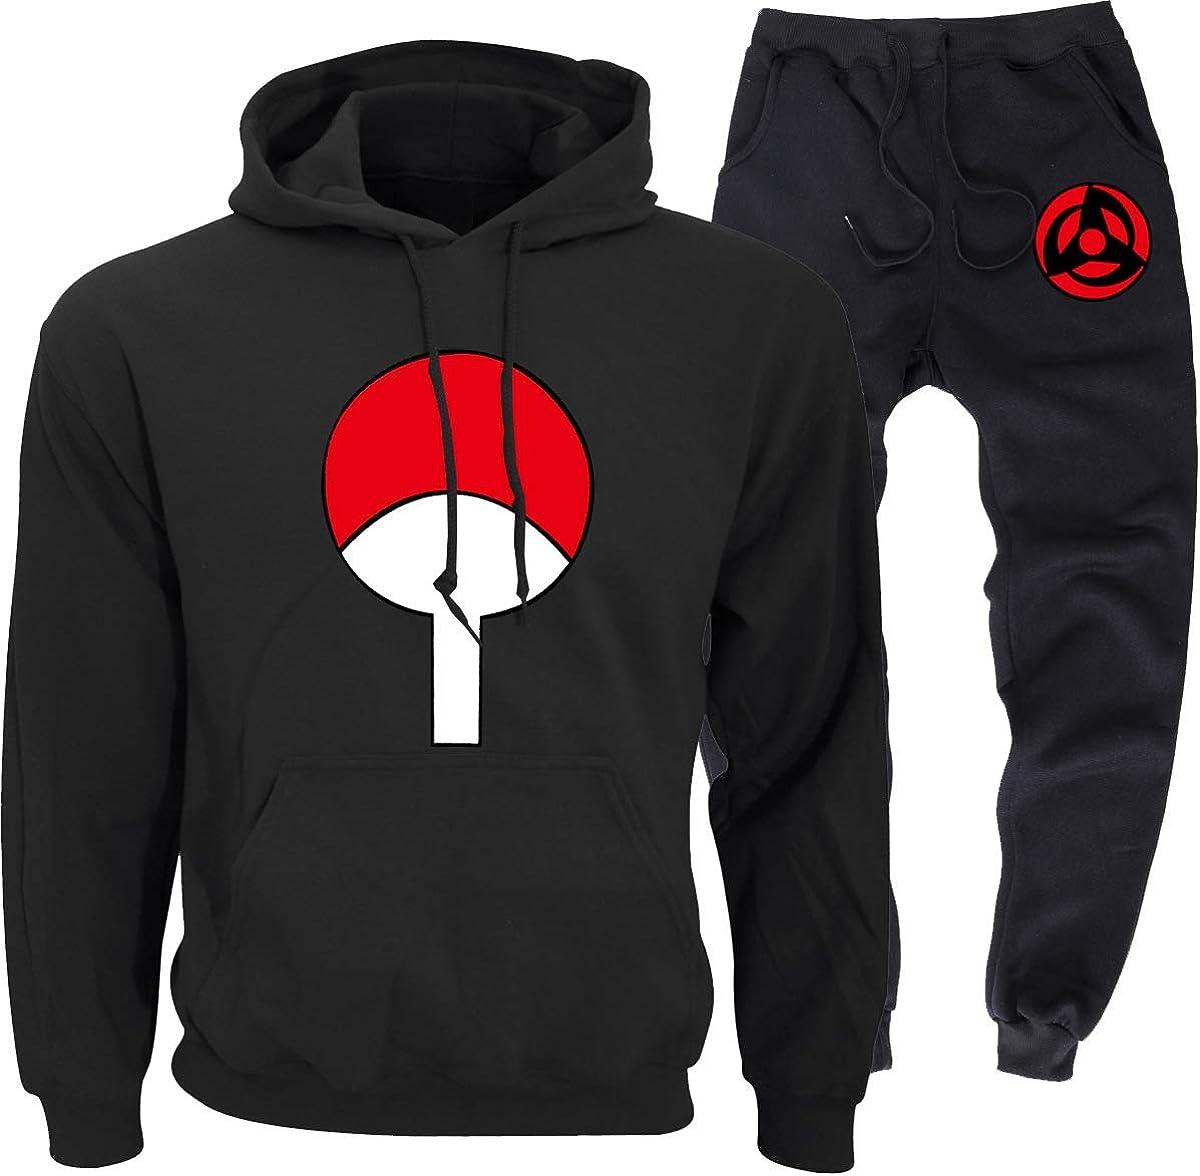 LWJNB Naruto Unisex Herren Jogginganzug Freizeitanzug Hausanzug Trainingsanzug Sportanzug